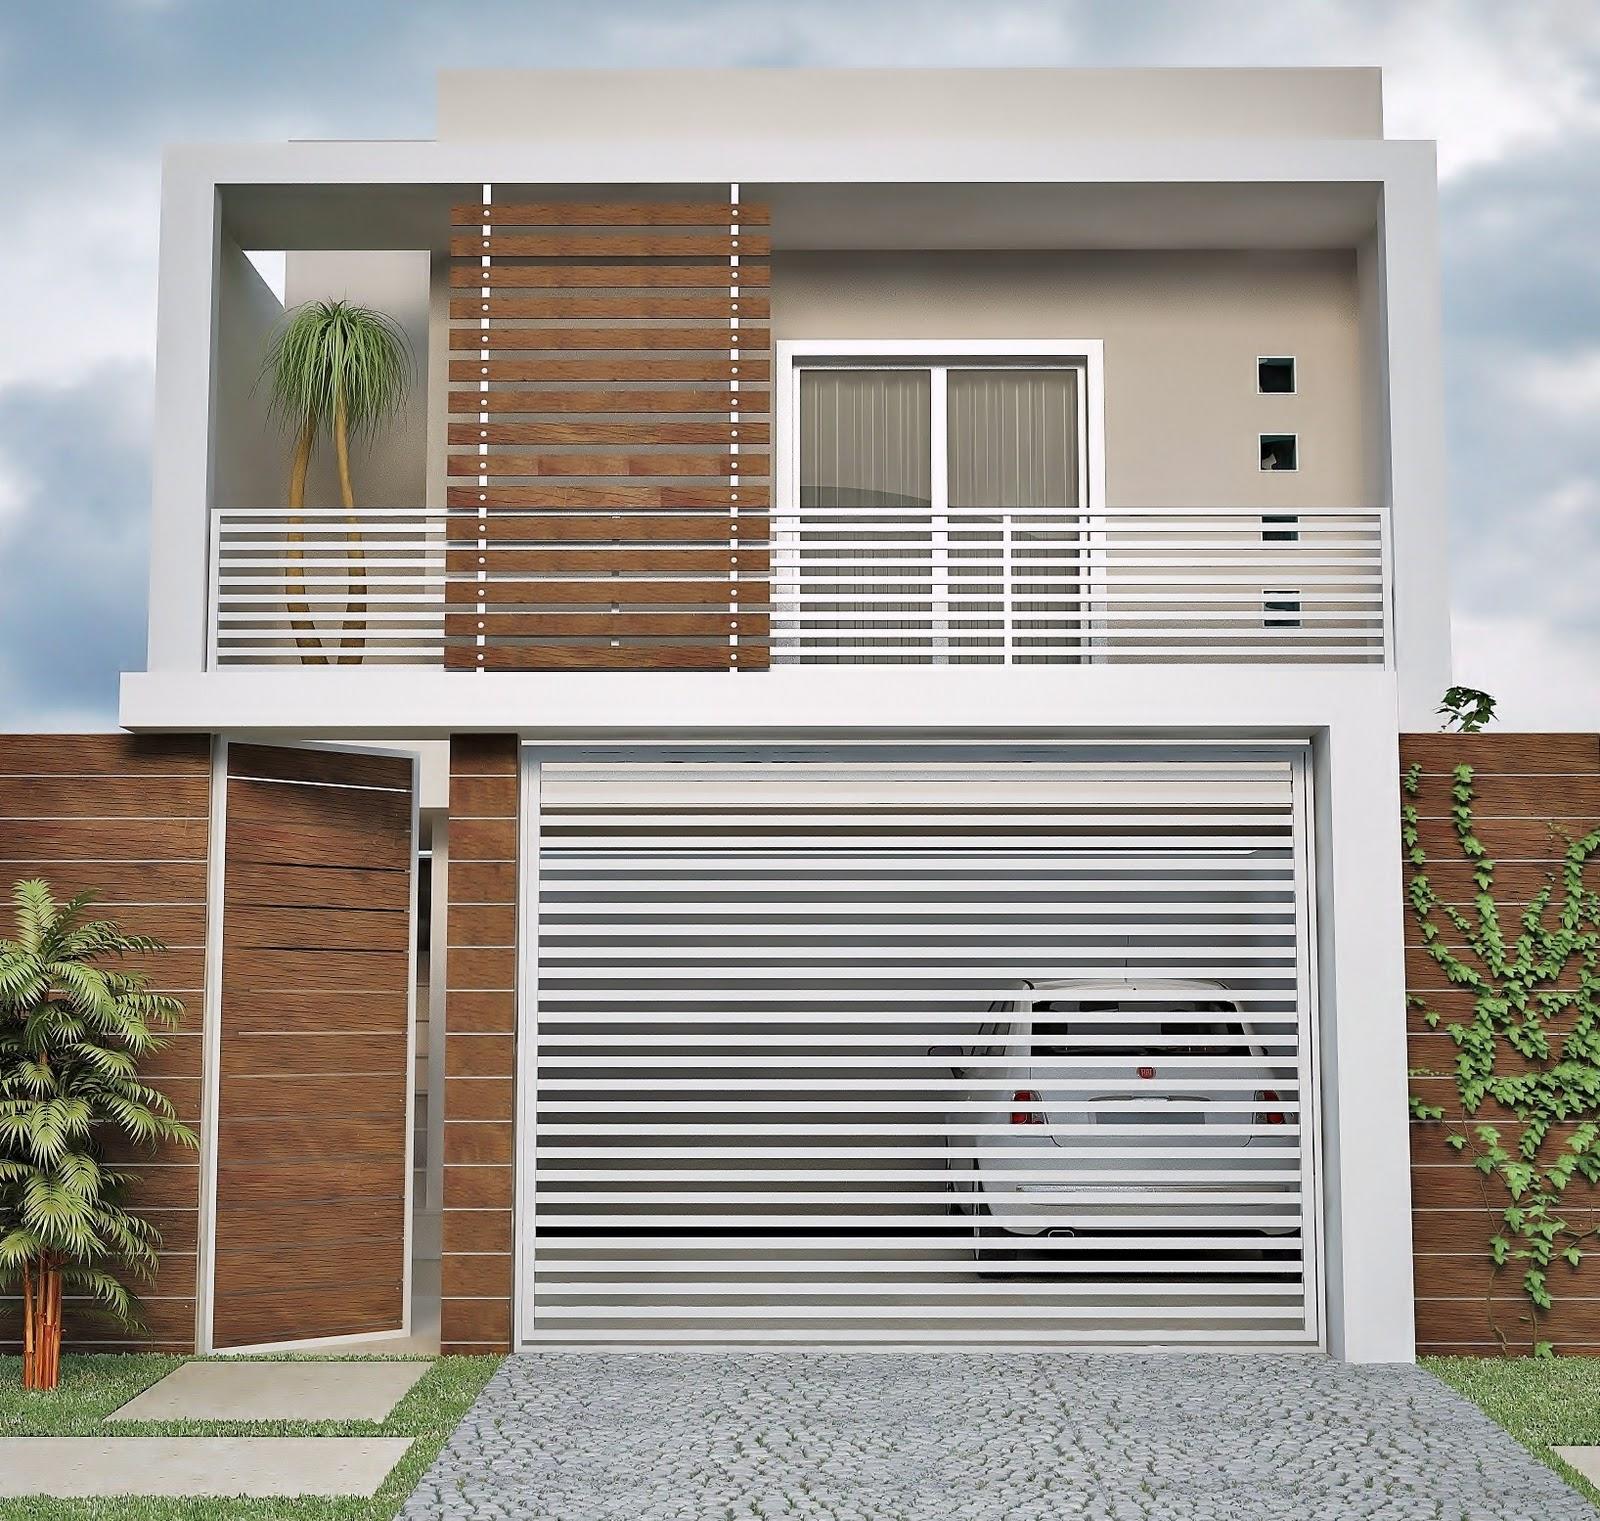 10 modelos de fachadas de casas baratas for Casa minimalista 70m2